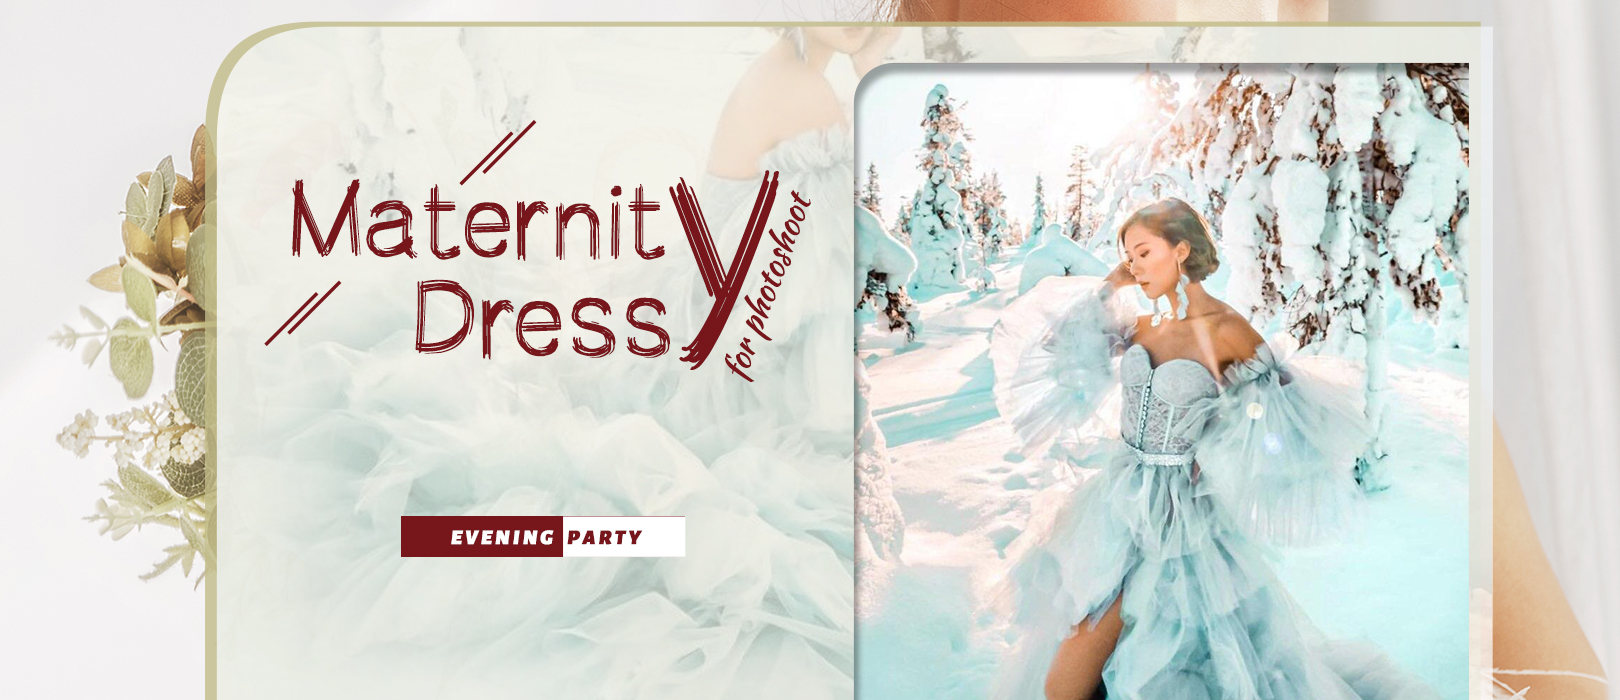 0000banner Tipsforastylishpregnancy - Maternity Dresses